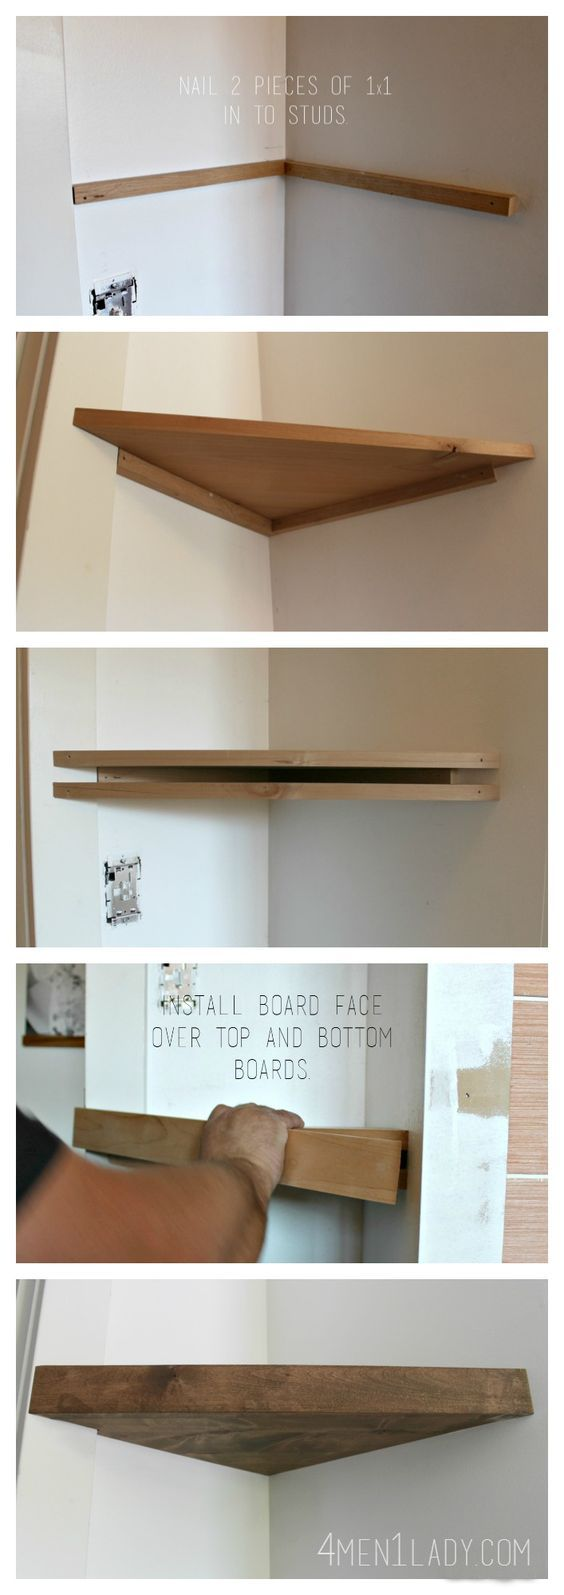 Bathroom shelves corner - How To Make Floating Corner Shelves Tutorial 4men1lady Com Diy Home Improvement Bloggers Best Pinterest Floating Corner Shelves Corner Shelf And